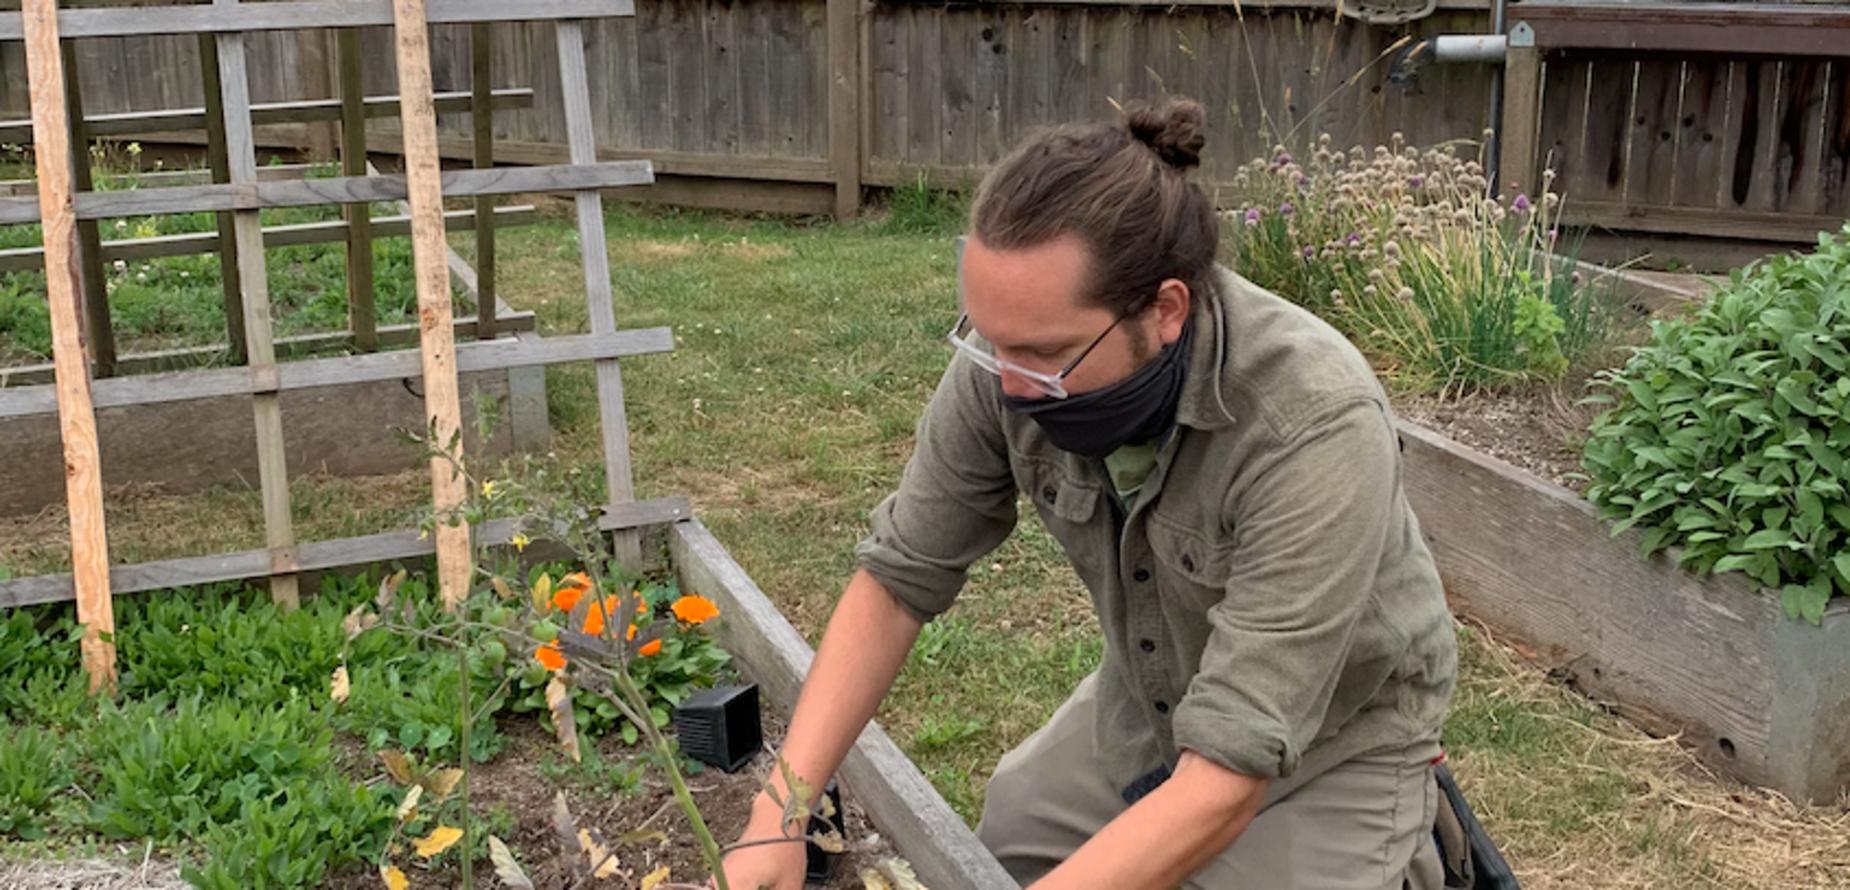 Man planting tomatoes